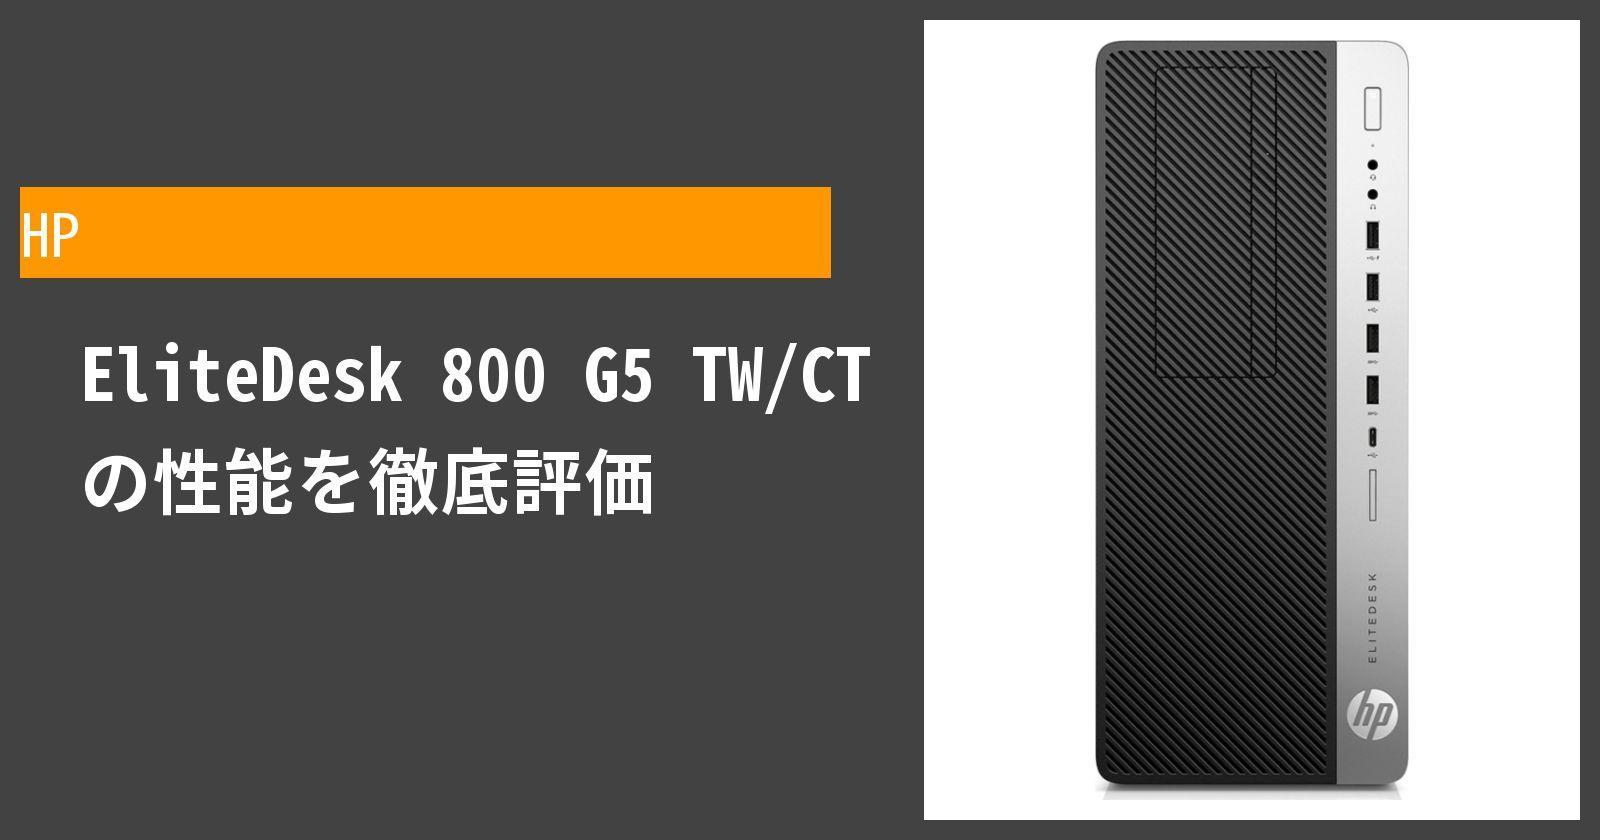 EliteDesk 800 G5 TW/CT の性能を徹底評価